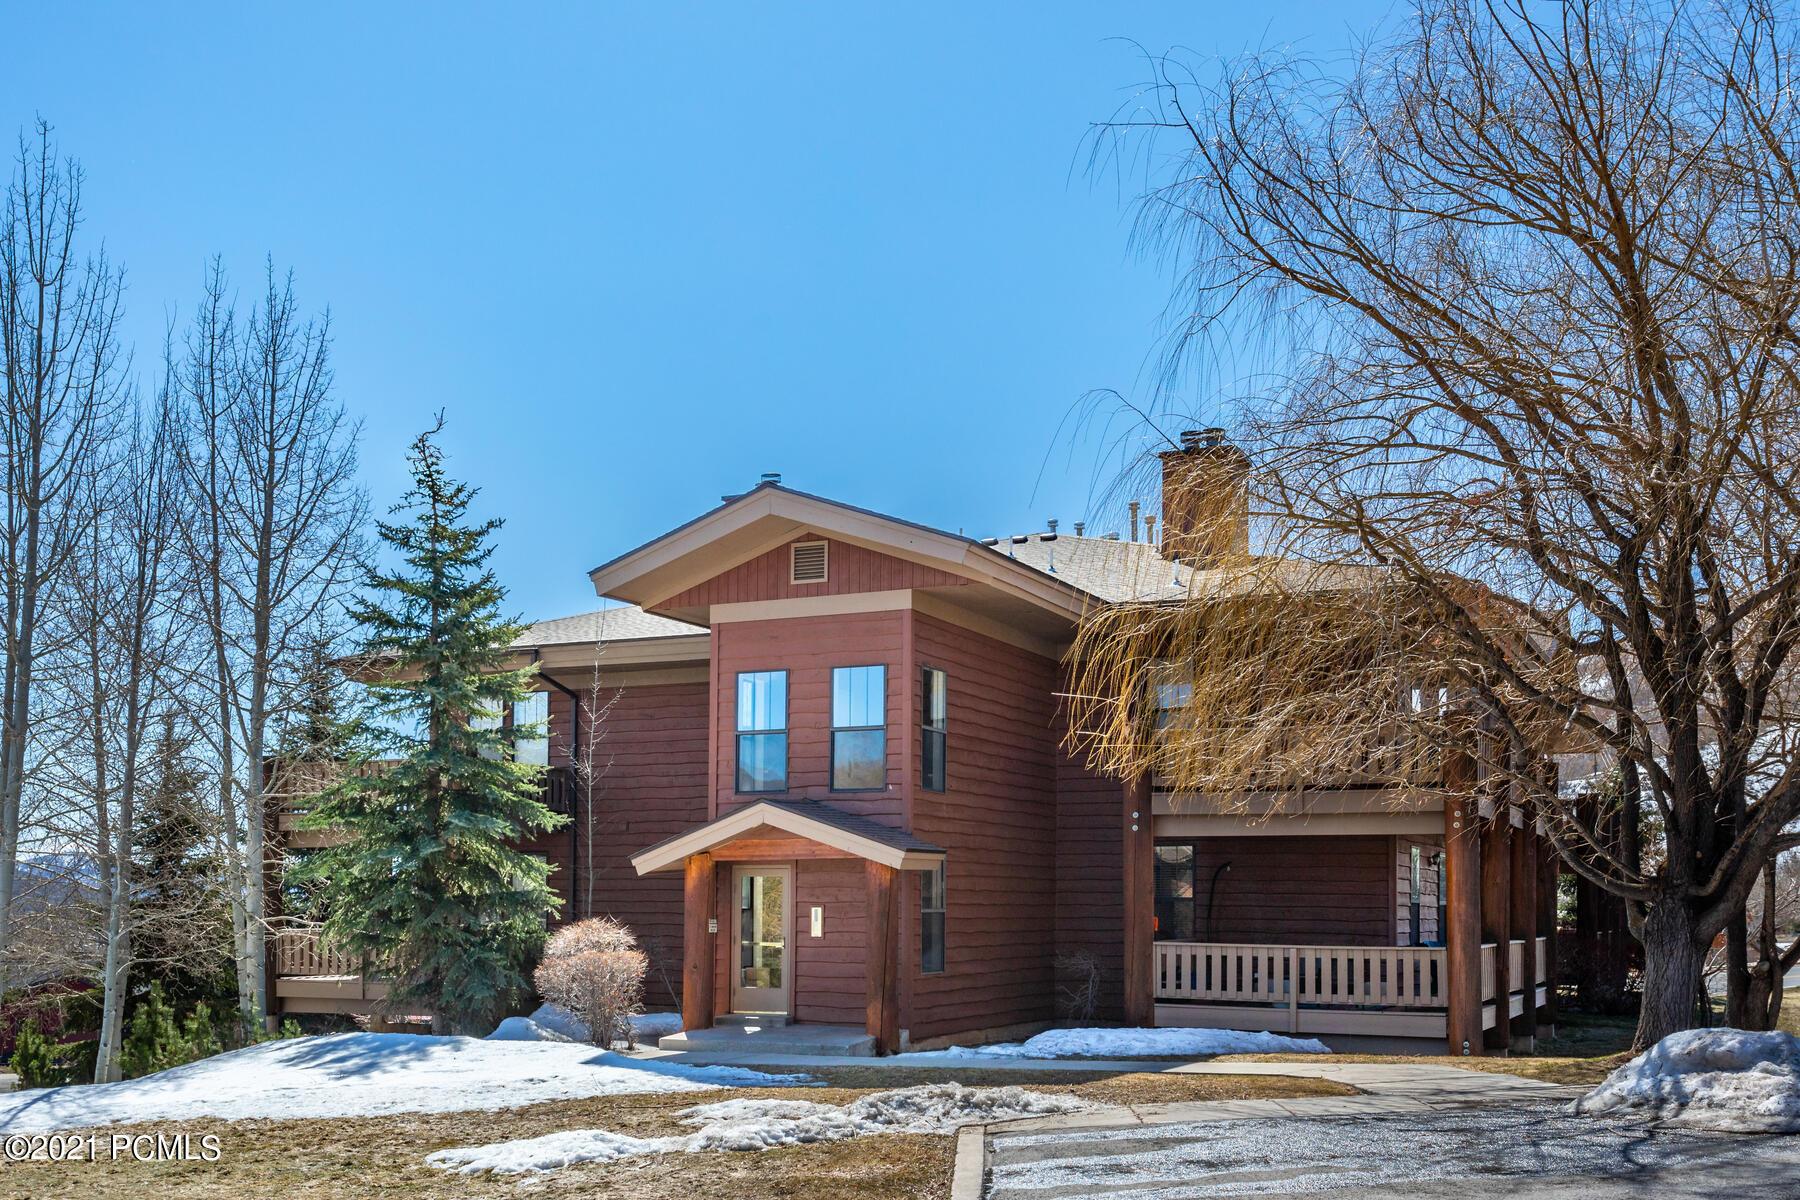 8350 Meadowview Court, Park City, Utah 84098, 2 Bedrooms Bedrooms, ,2 BathroomsBathrooms,Condominium,For Sale,Meadowview,12101336